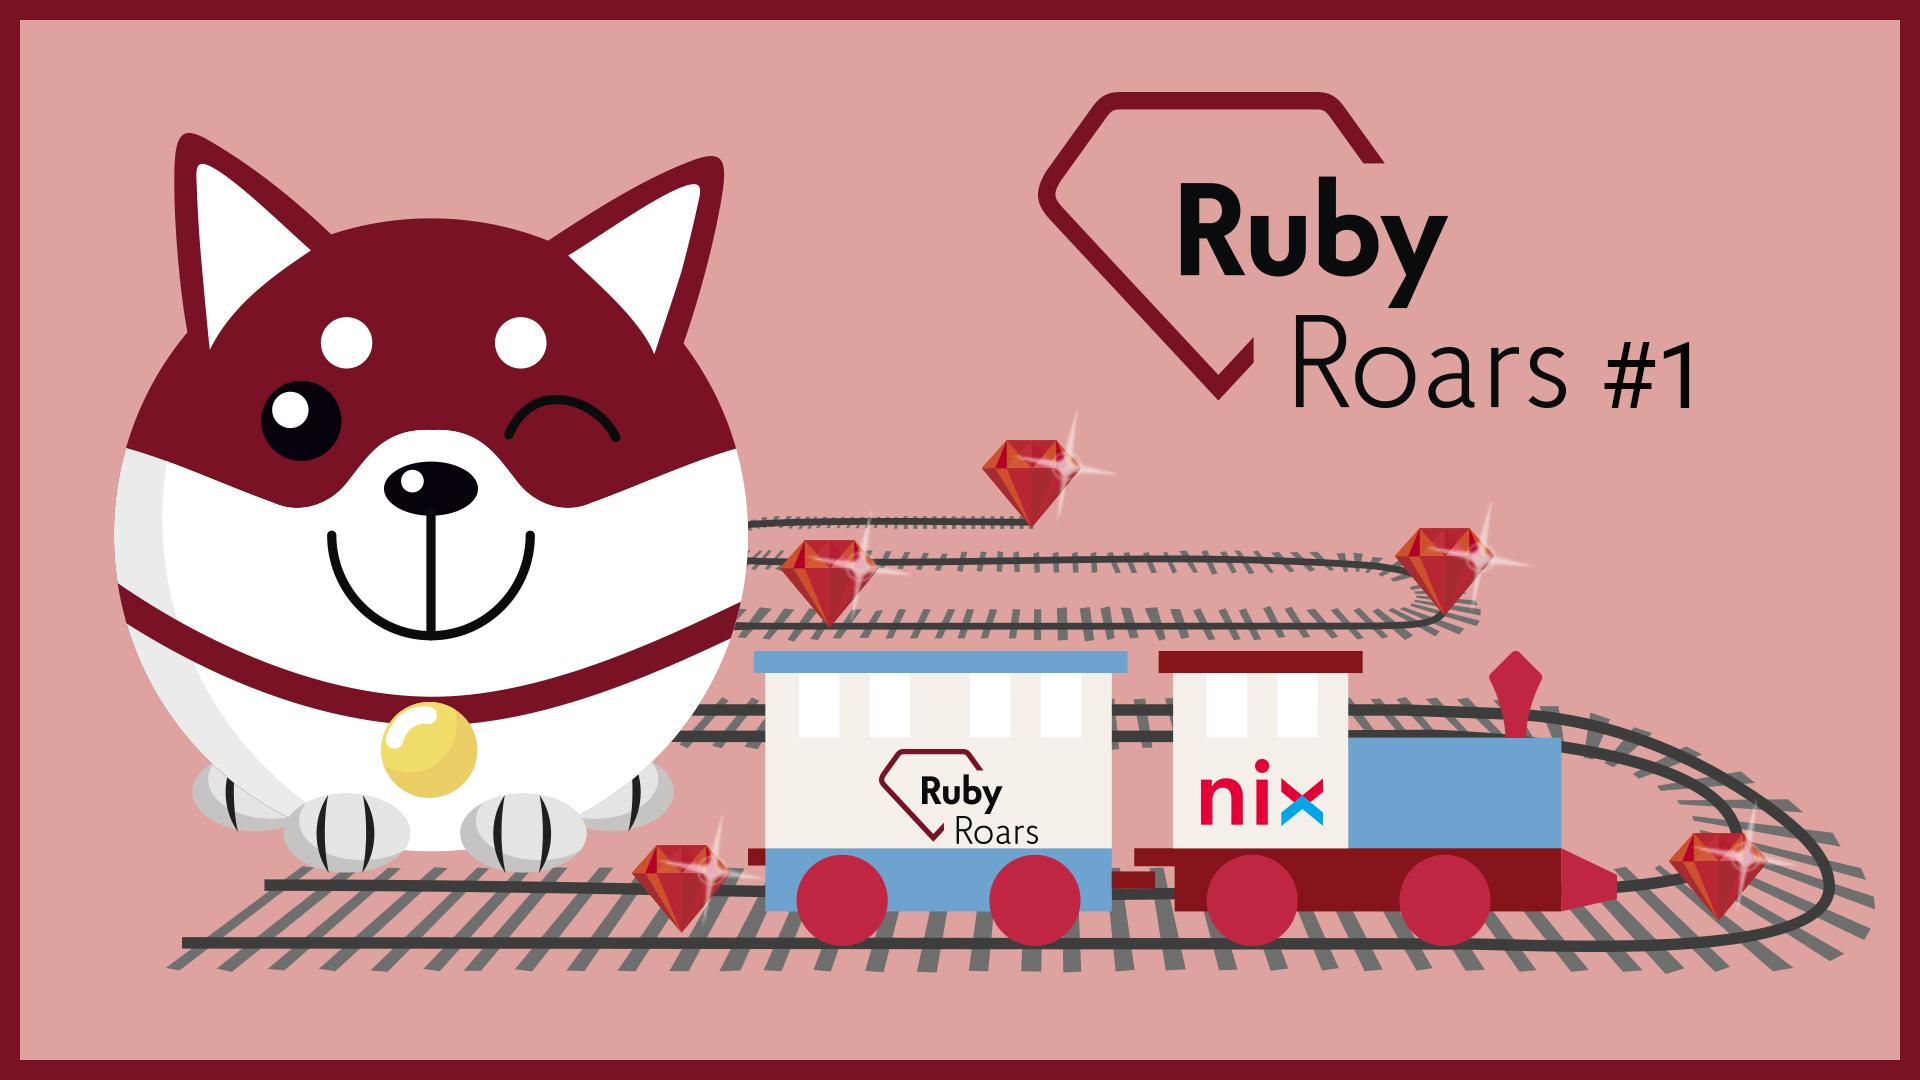 Announcement of the mitapa RubyRoars # 1 in Kharkov